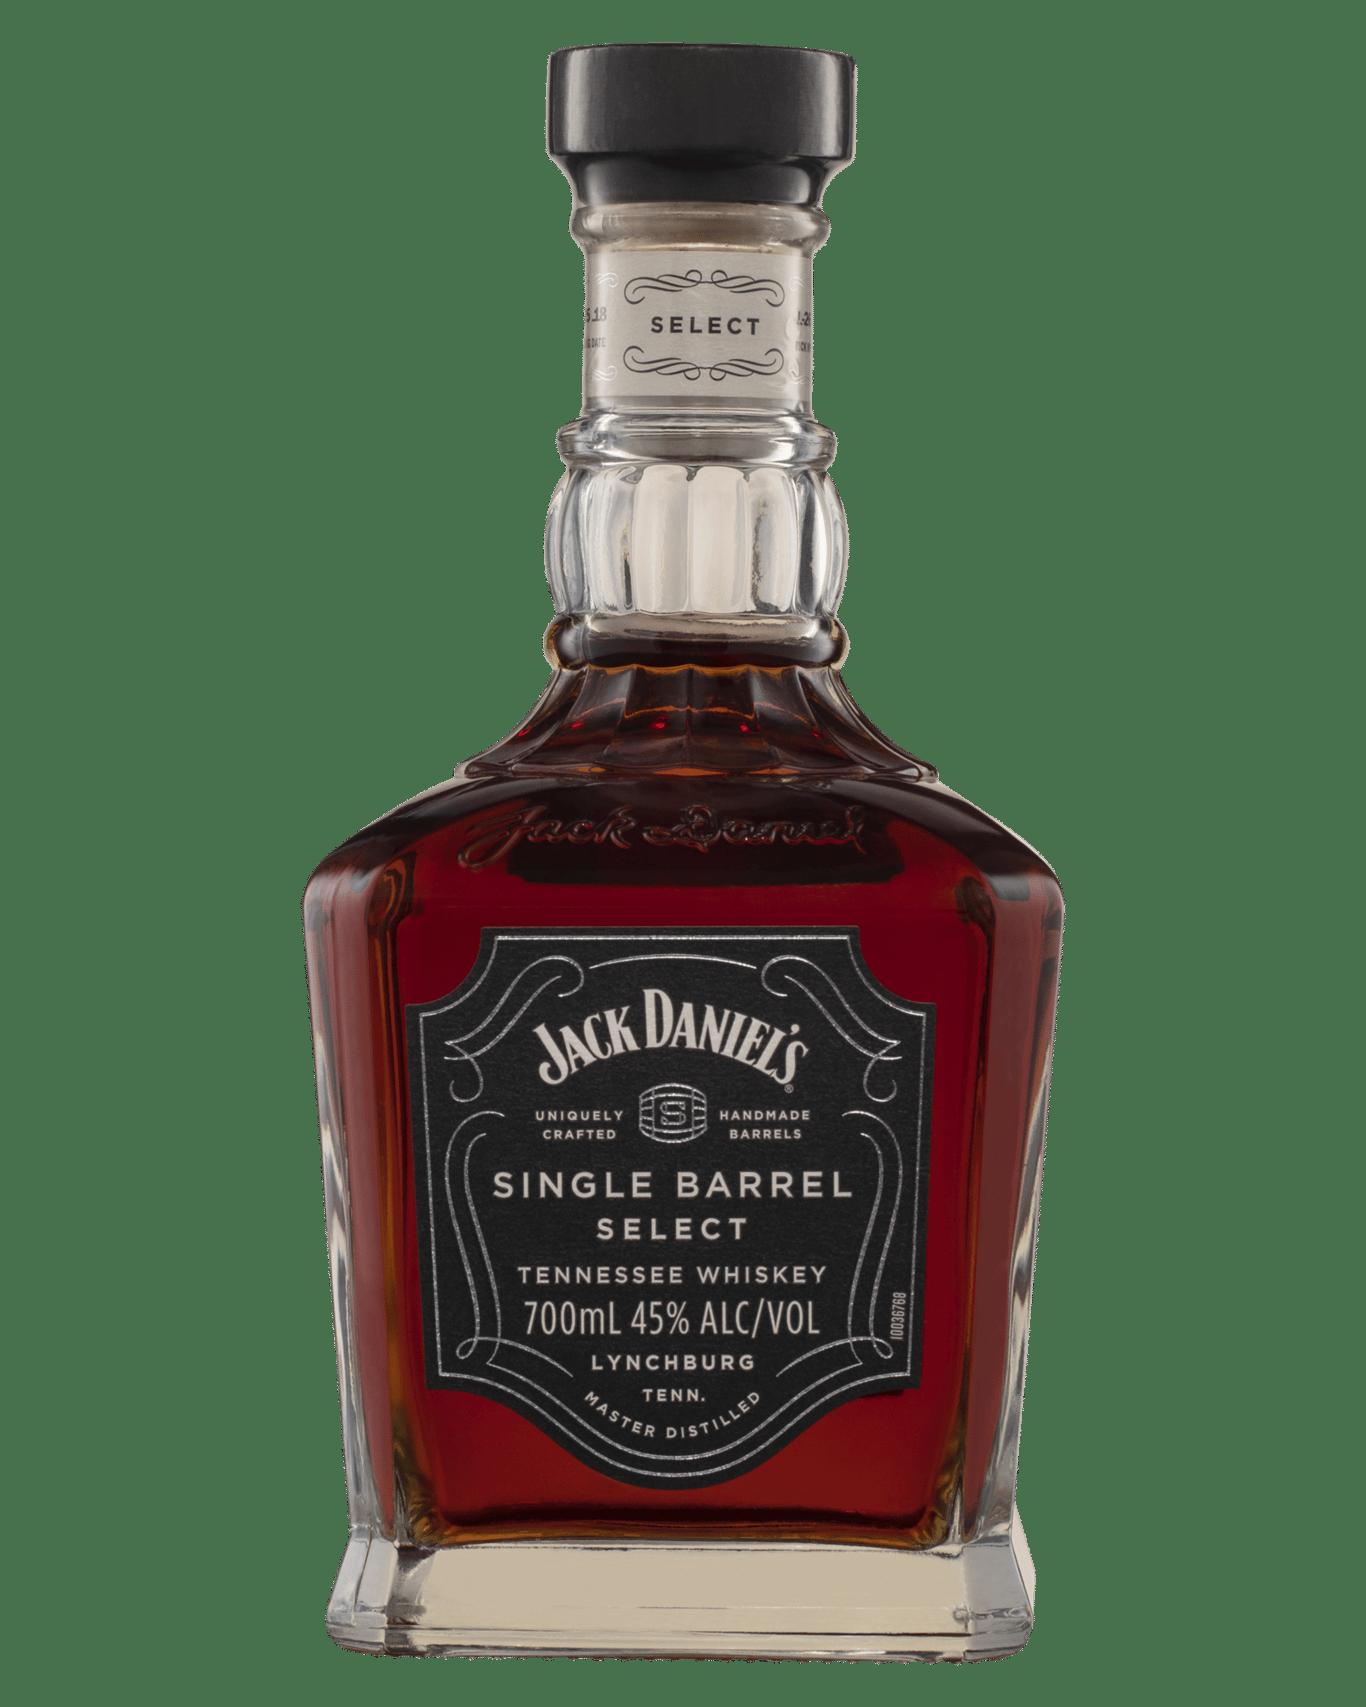 Jack Daniel S Single Barrel Select Tennessee Whiskey 700ml